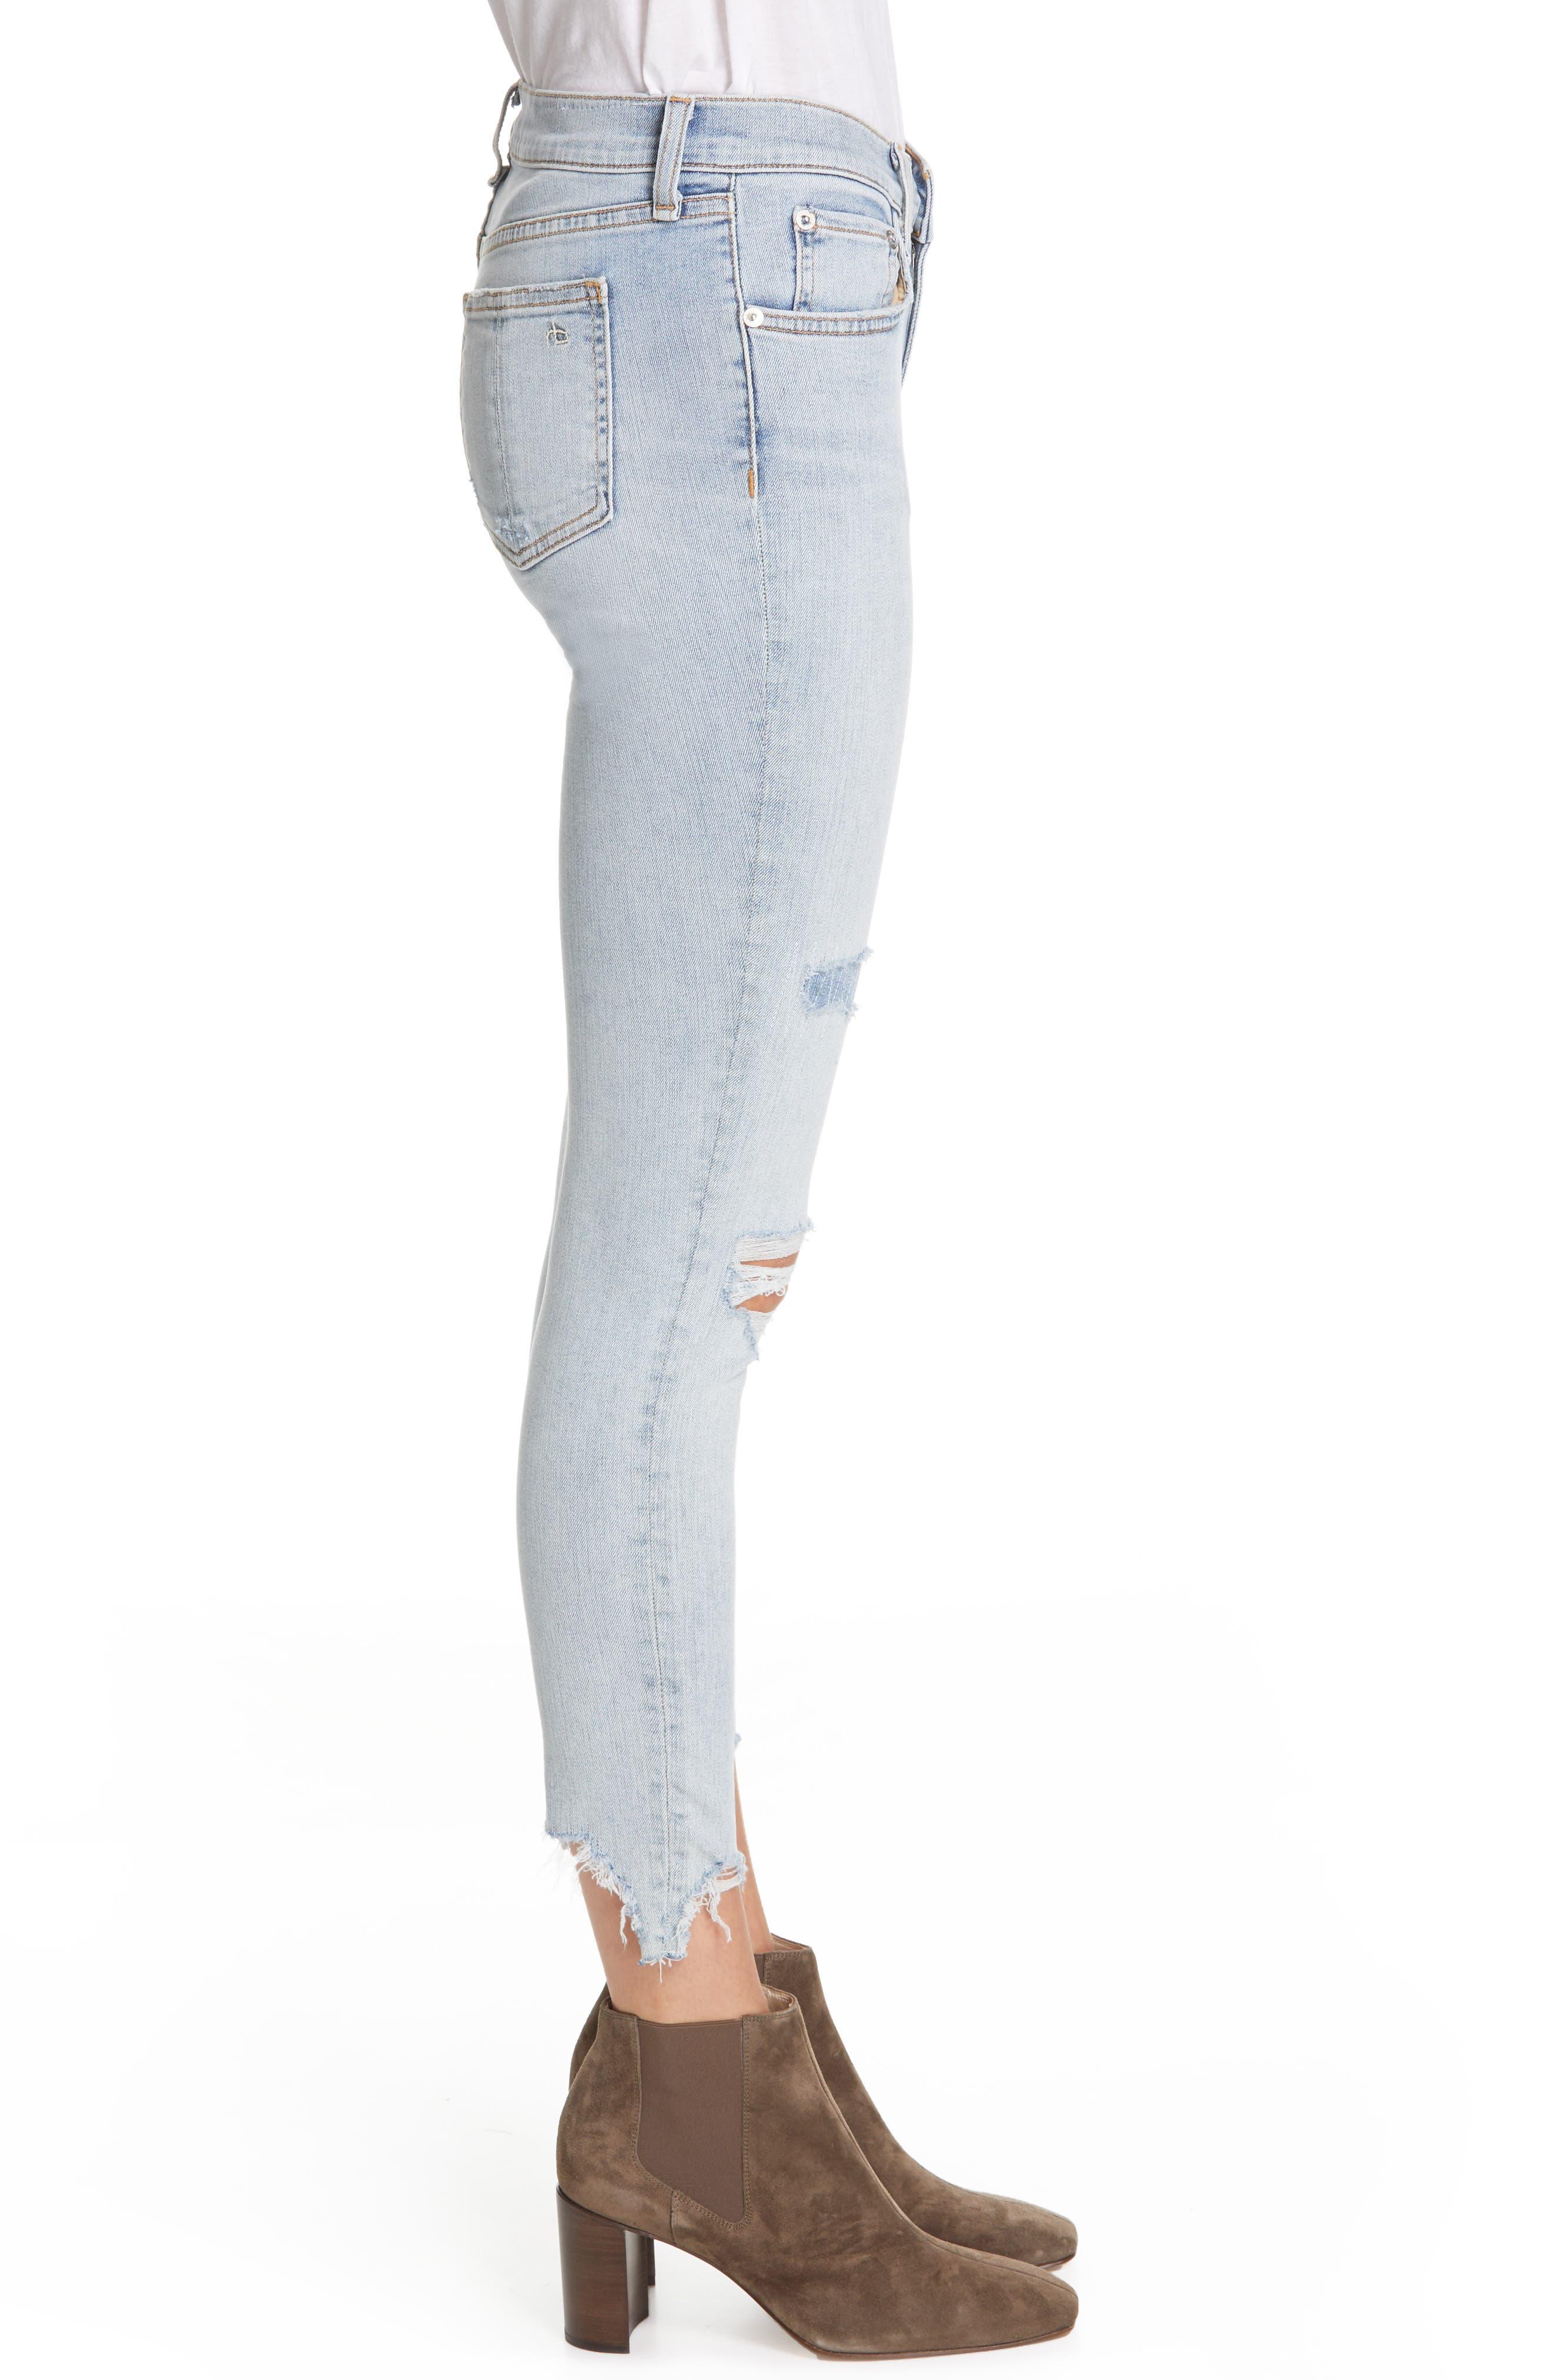 RAG & BONE, JEAN Ripped Ankle Skinny Jeans, Alternate thumbnail 4, color, 450